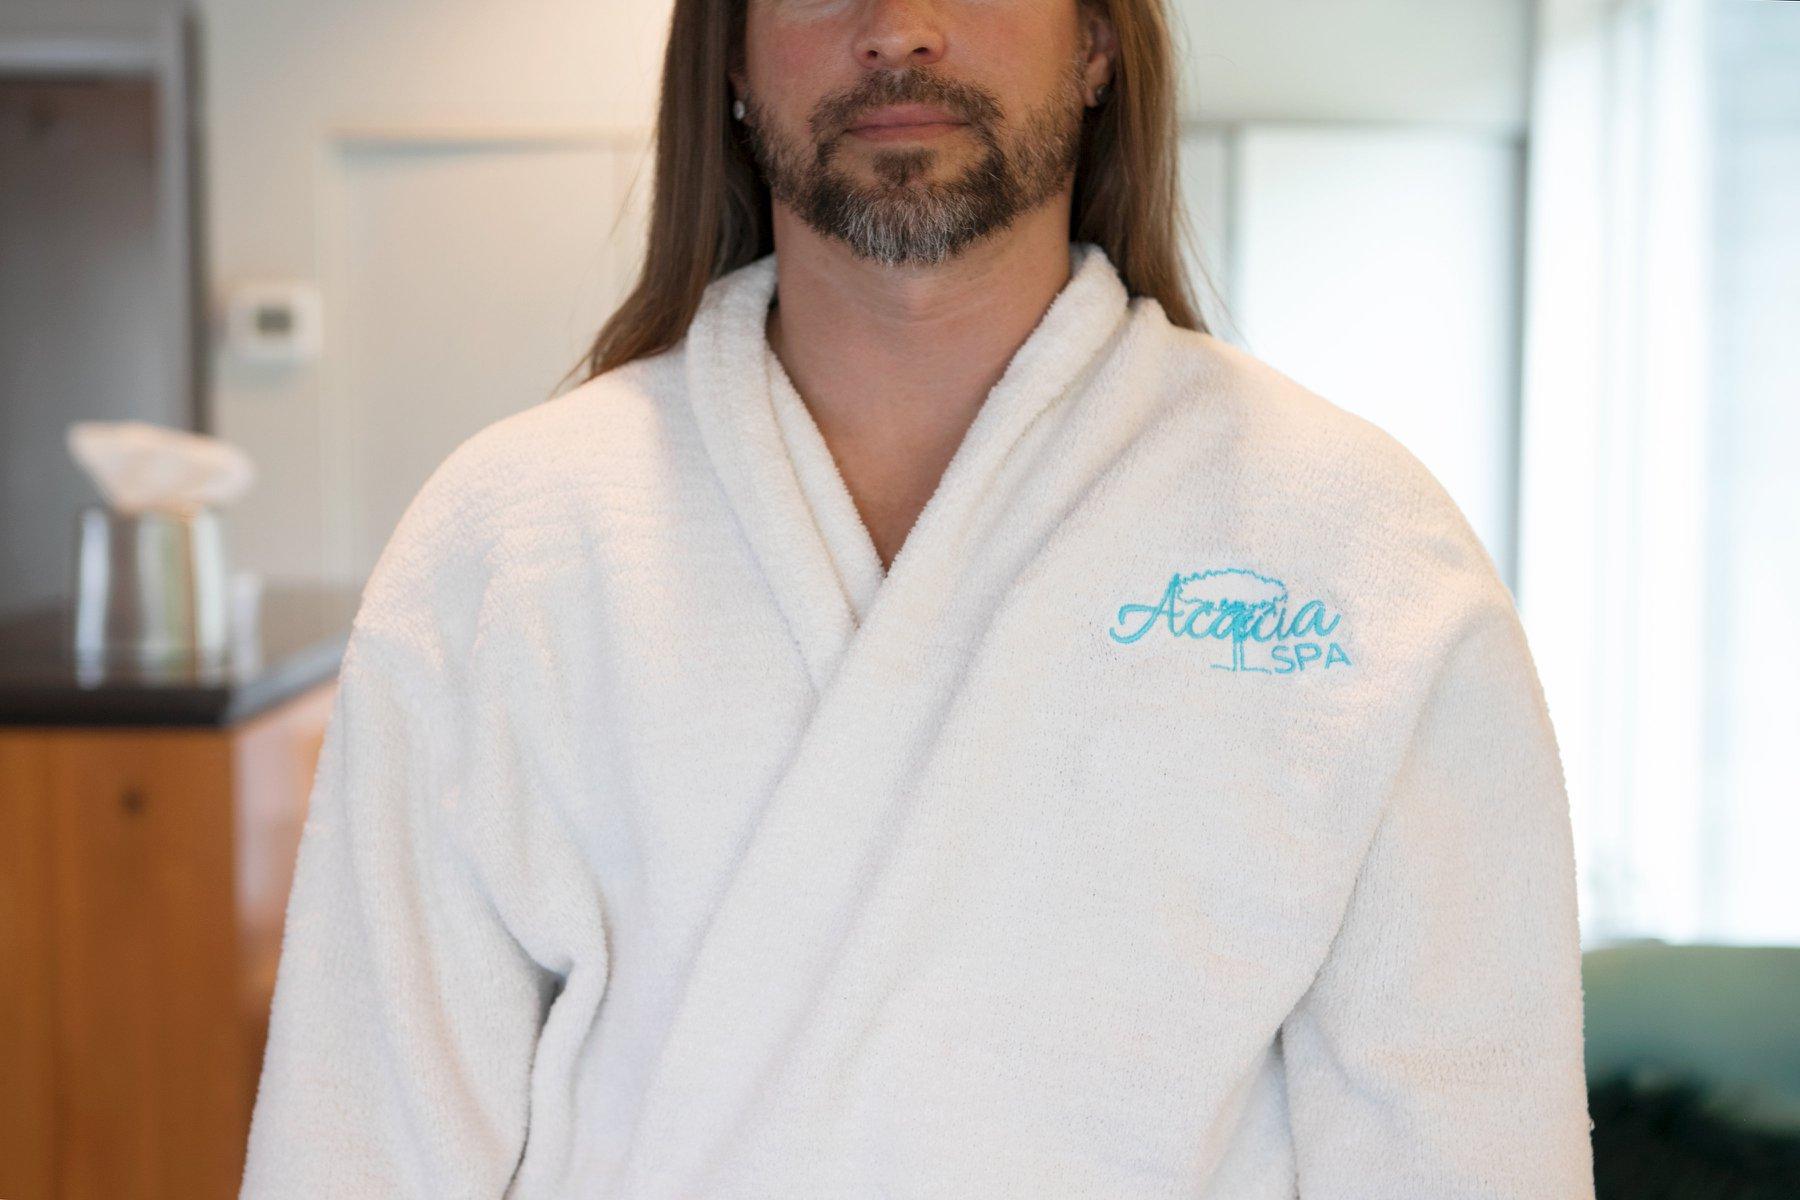 acacia spa springfield missouri man robe